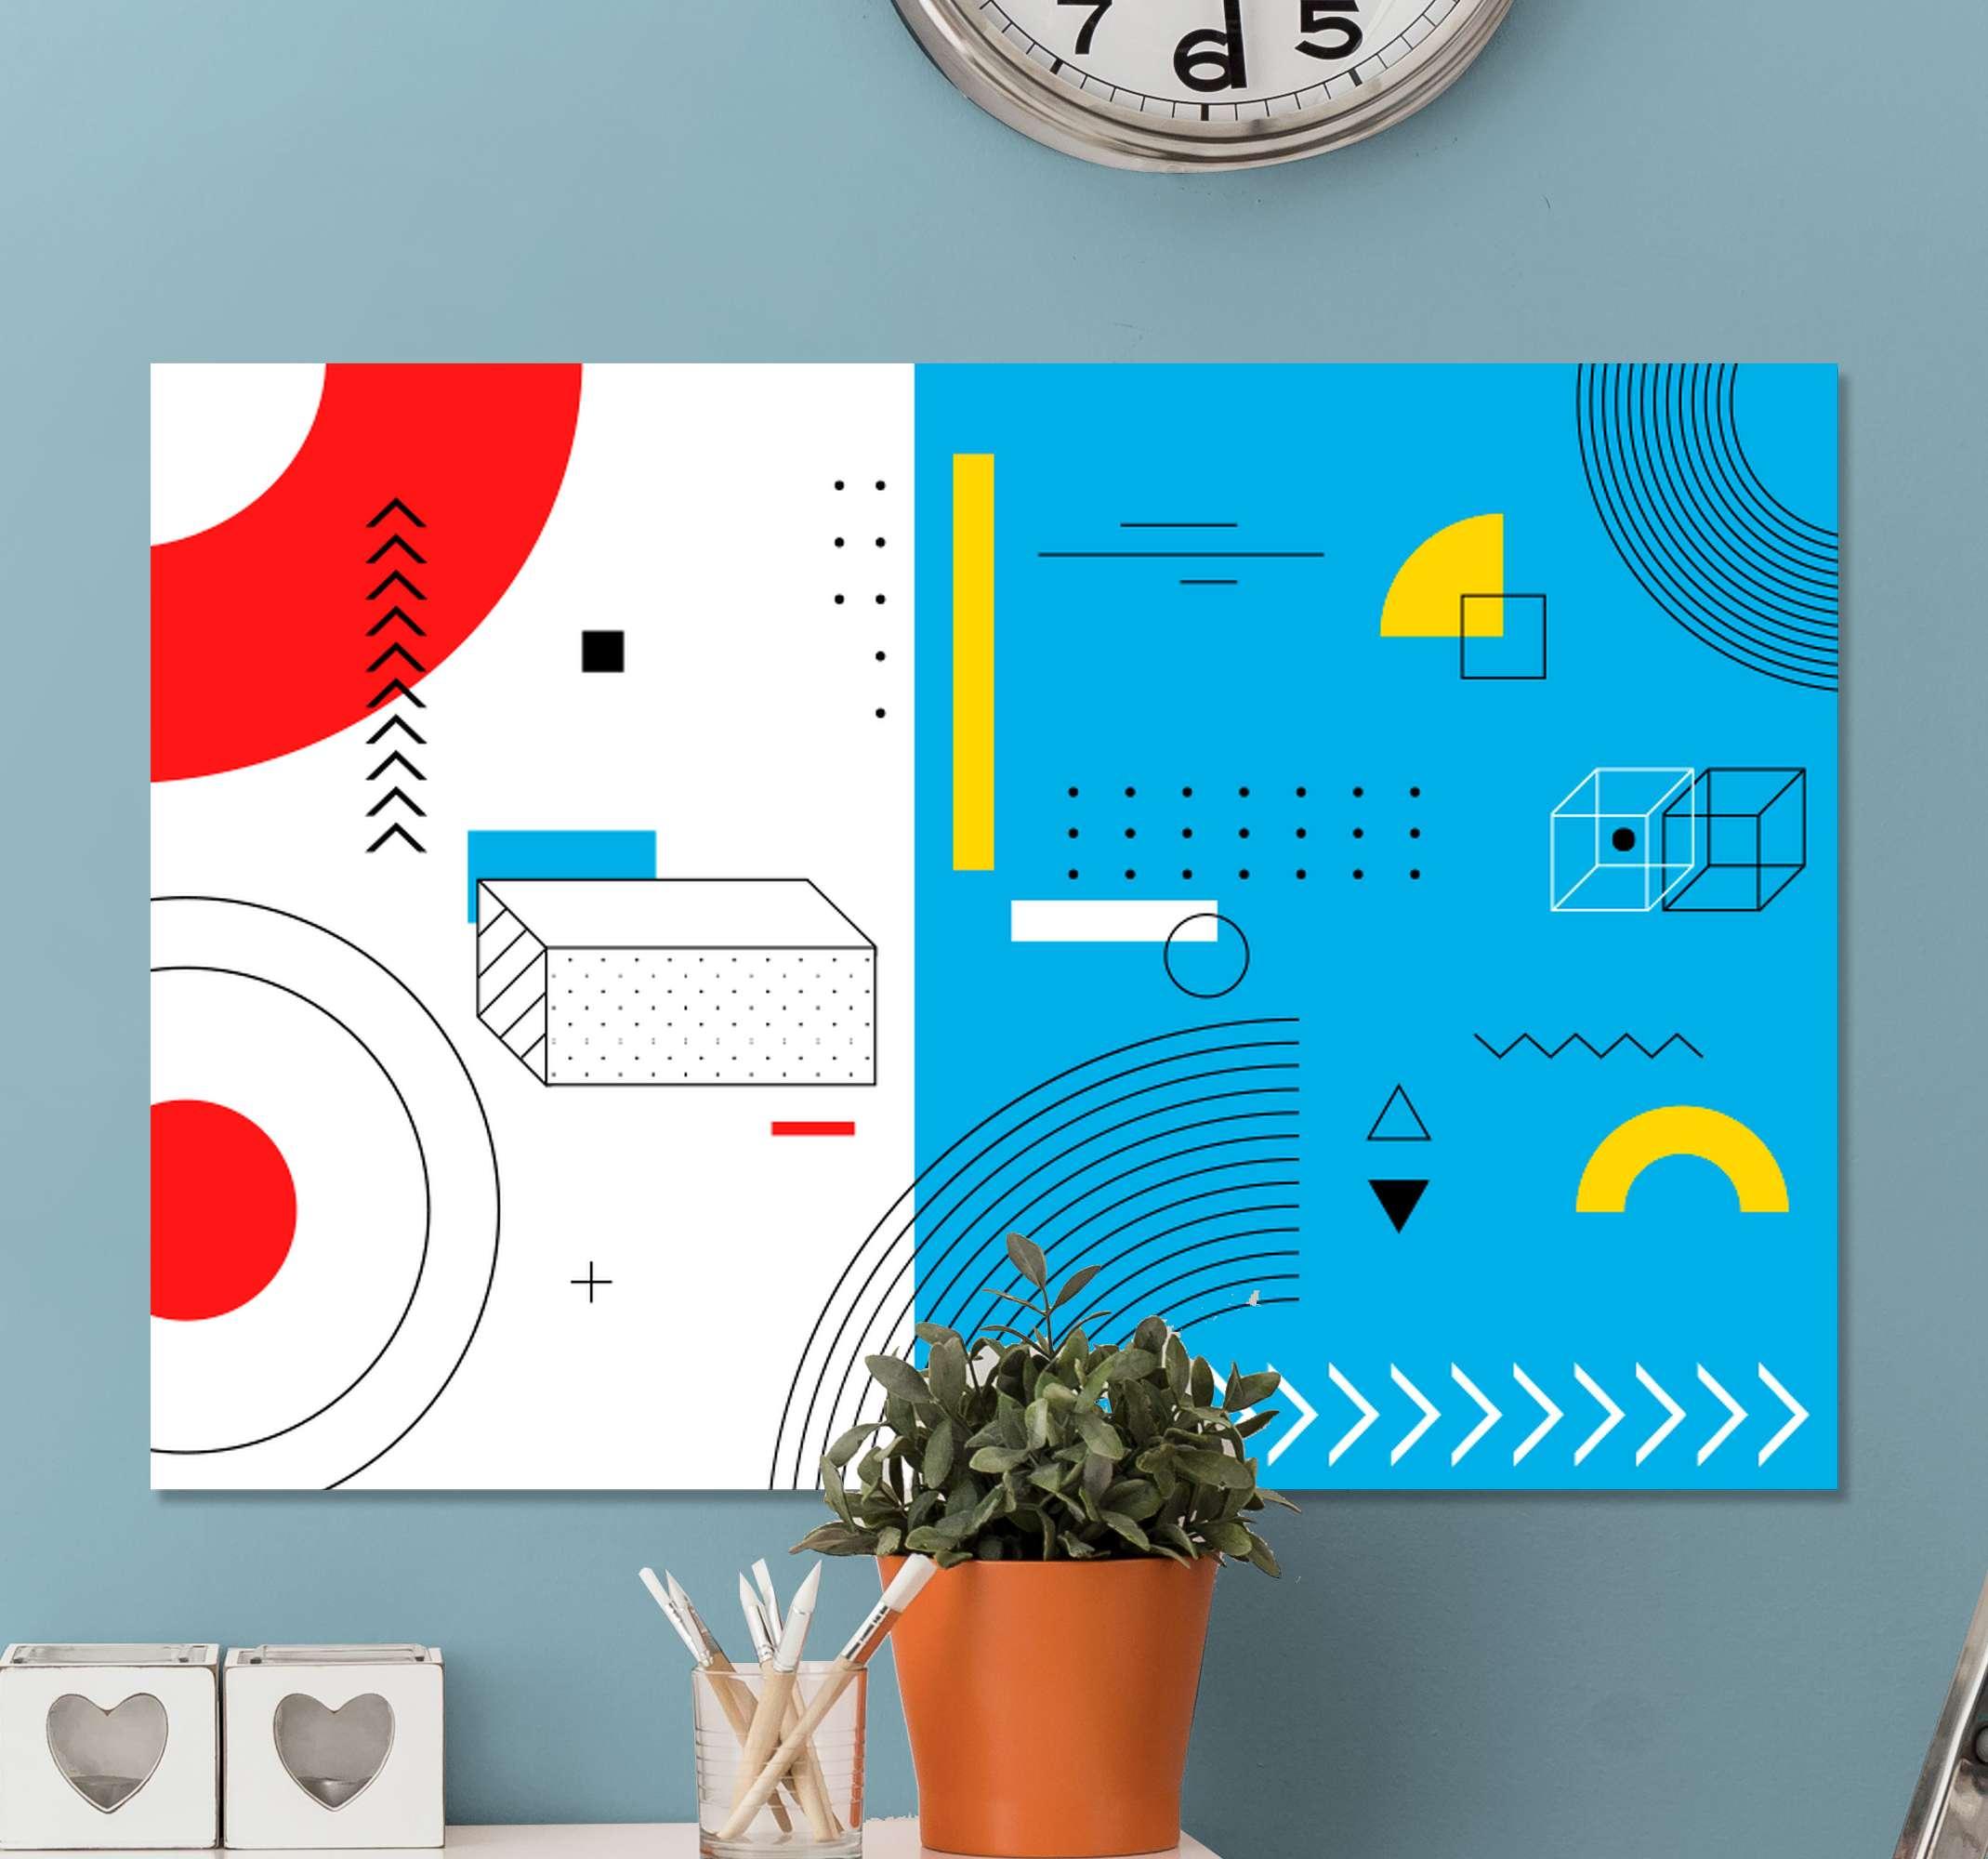 TenStickers. 우아함 lineas abstractas 정교한 캔버스 인쇄. 당신을 놀라게 할 슈퍼 복잡한 우아한 모양의 캔버스 벽 예술! +10,000 명의 만족 한 고객과 함께 당신은 좋은 손에 있습니다.